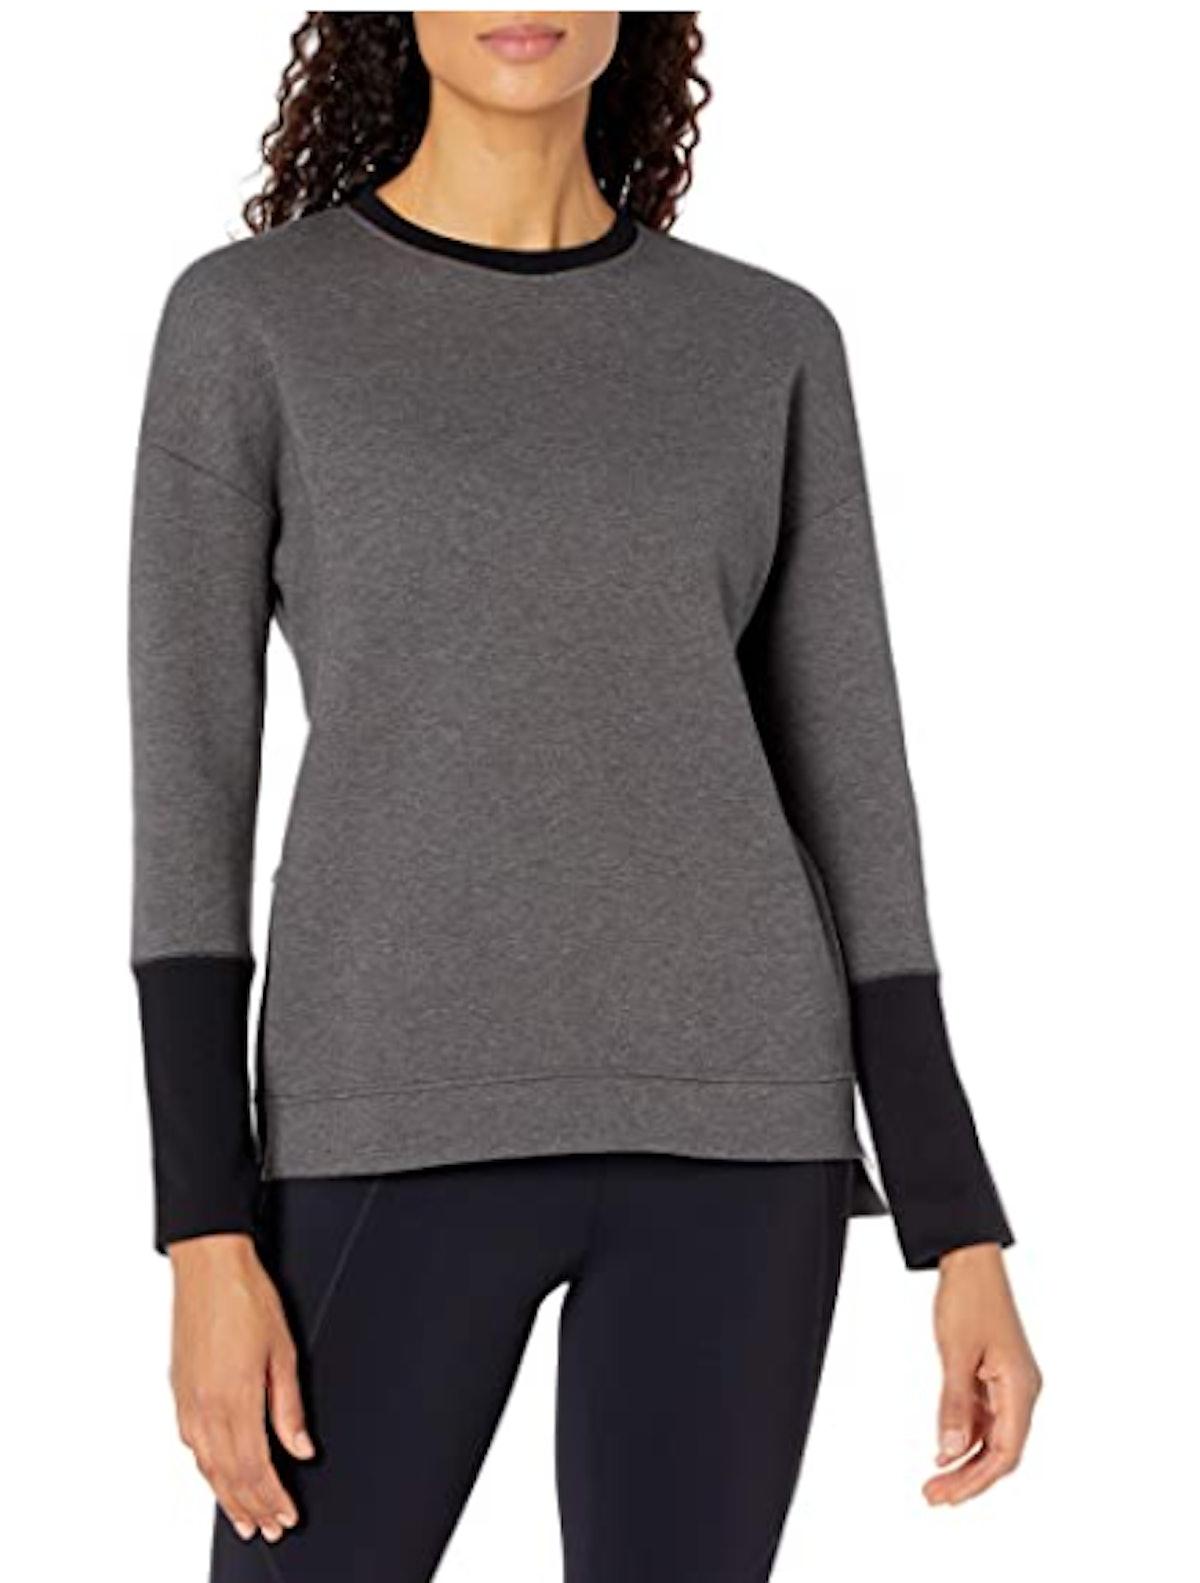 Core 10 Motion Tech Sweatshirt